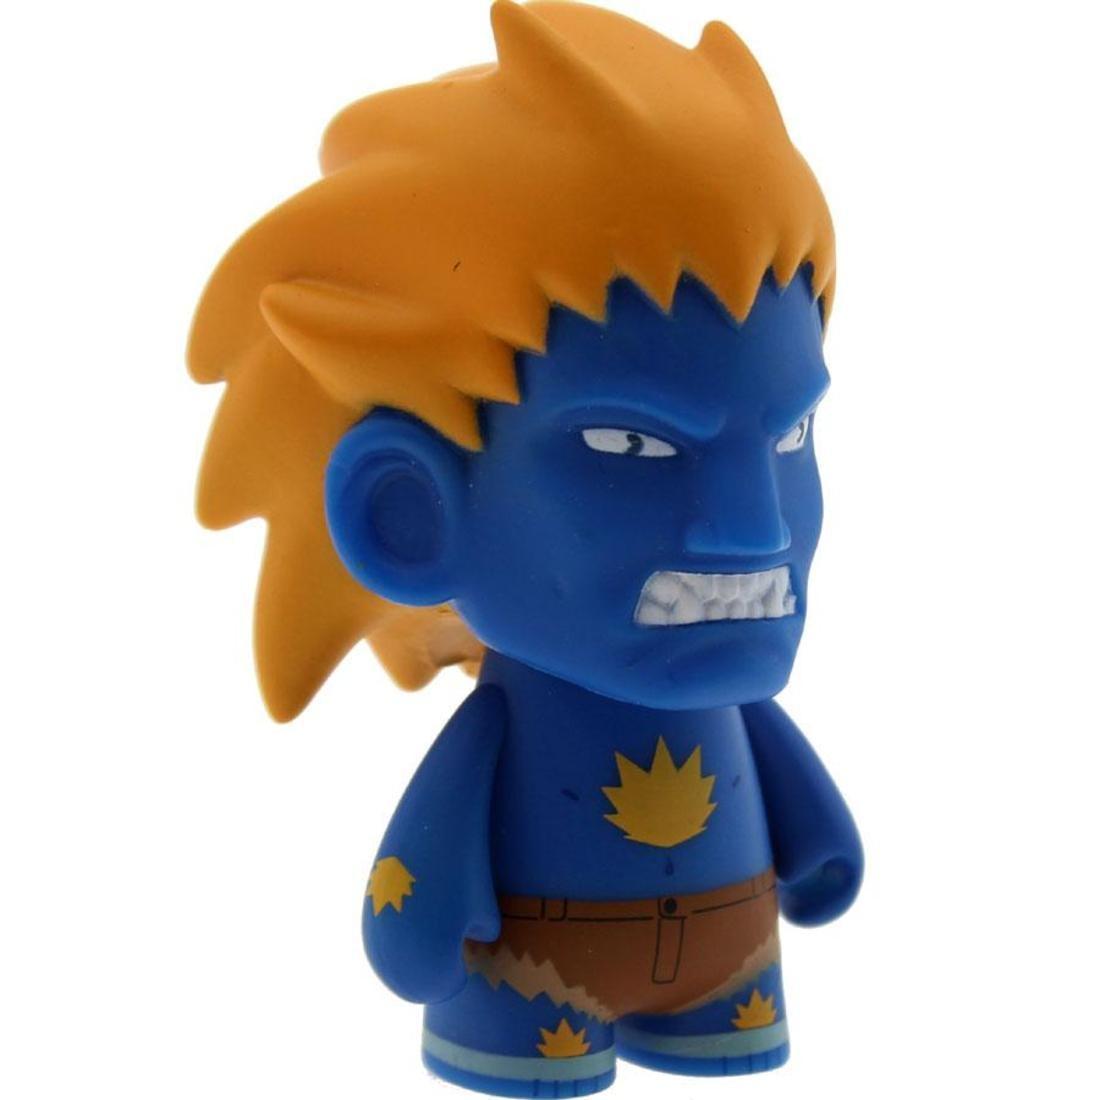 Kidrobot Street Fighter 3 Inch Mini Series Blanka Figure - 1/20 Ratio (blue)